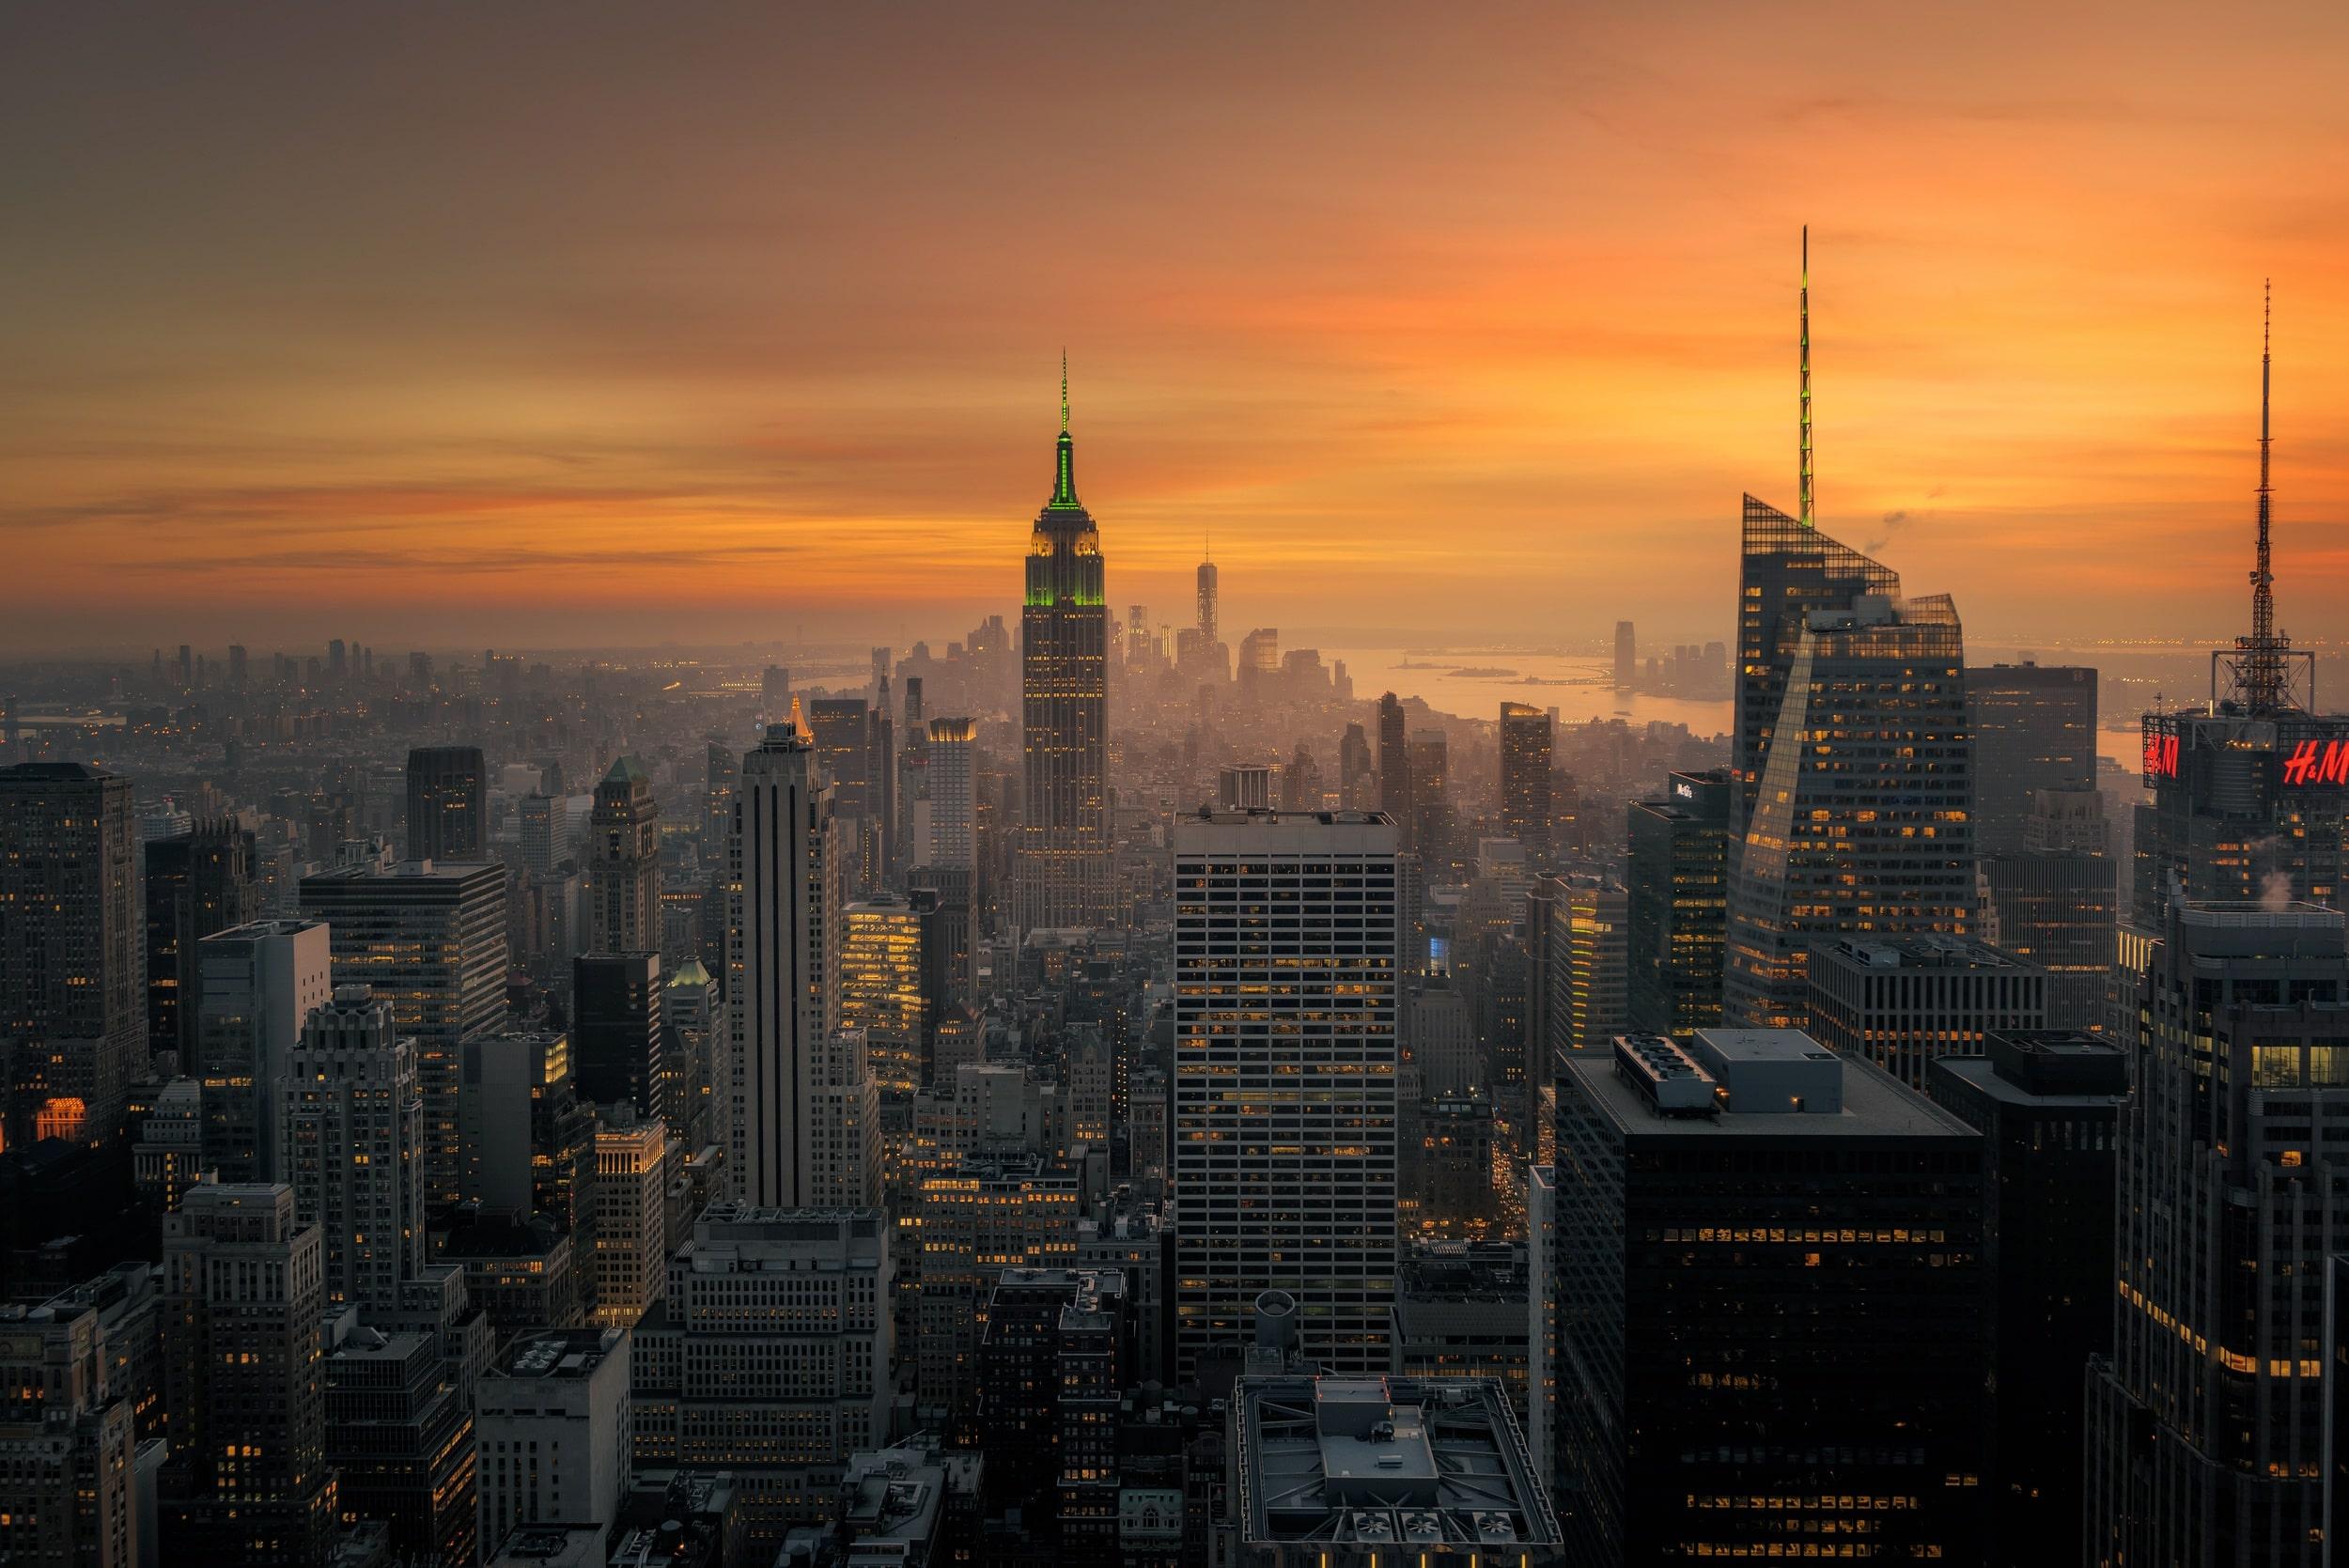 Man Made New York Cities United States USA City Cityscape Night 2500x1669